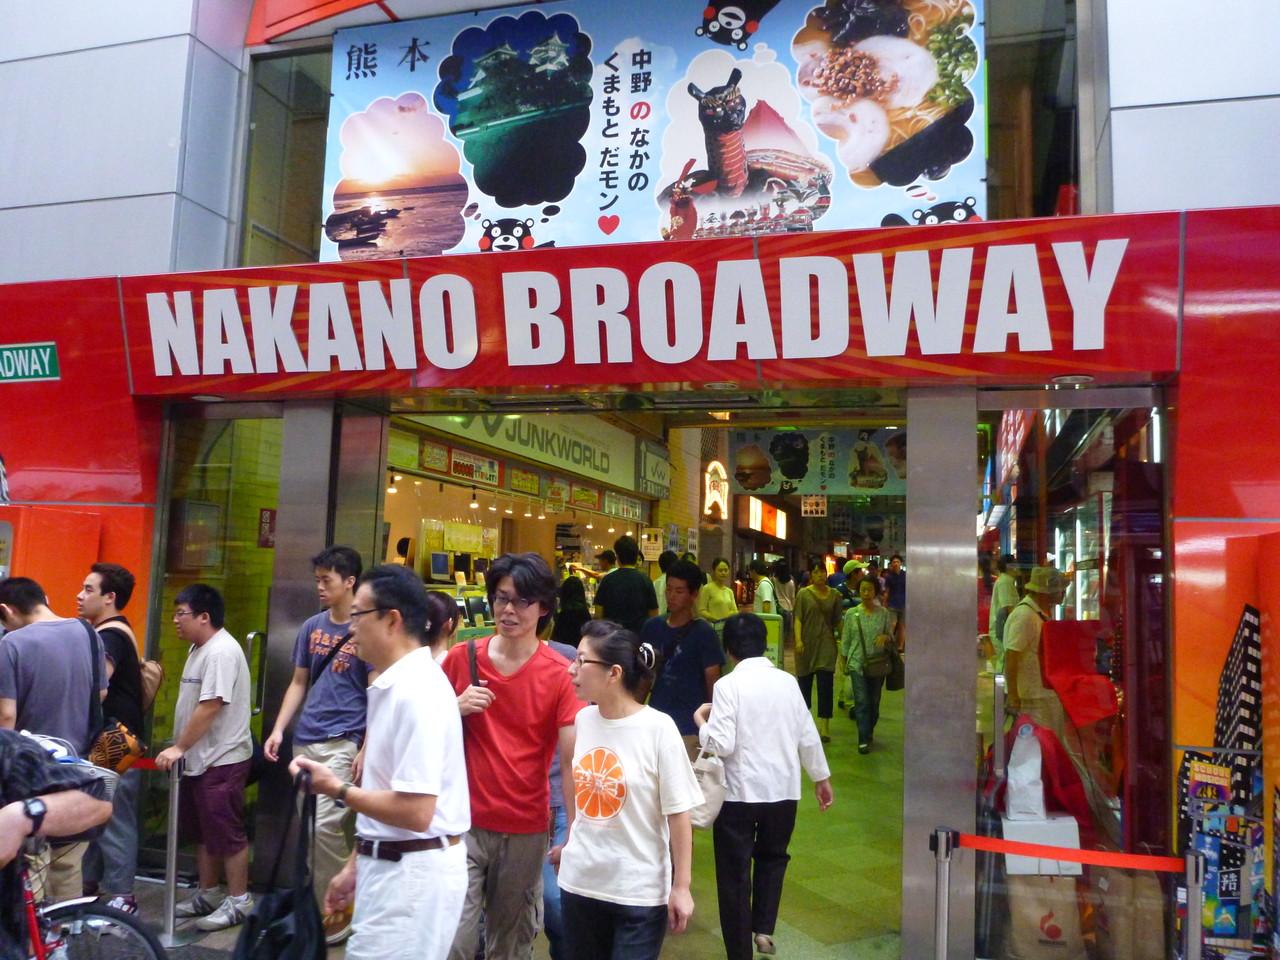 shinjuku walking tour nakano broadway